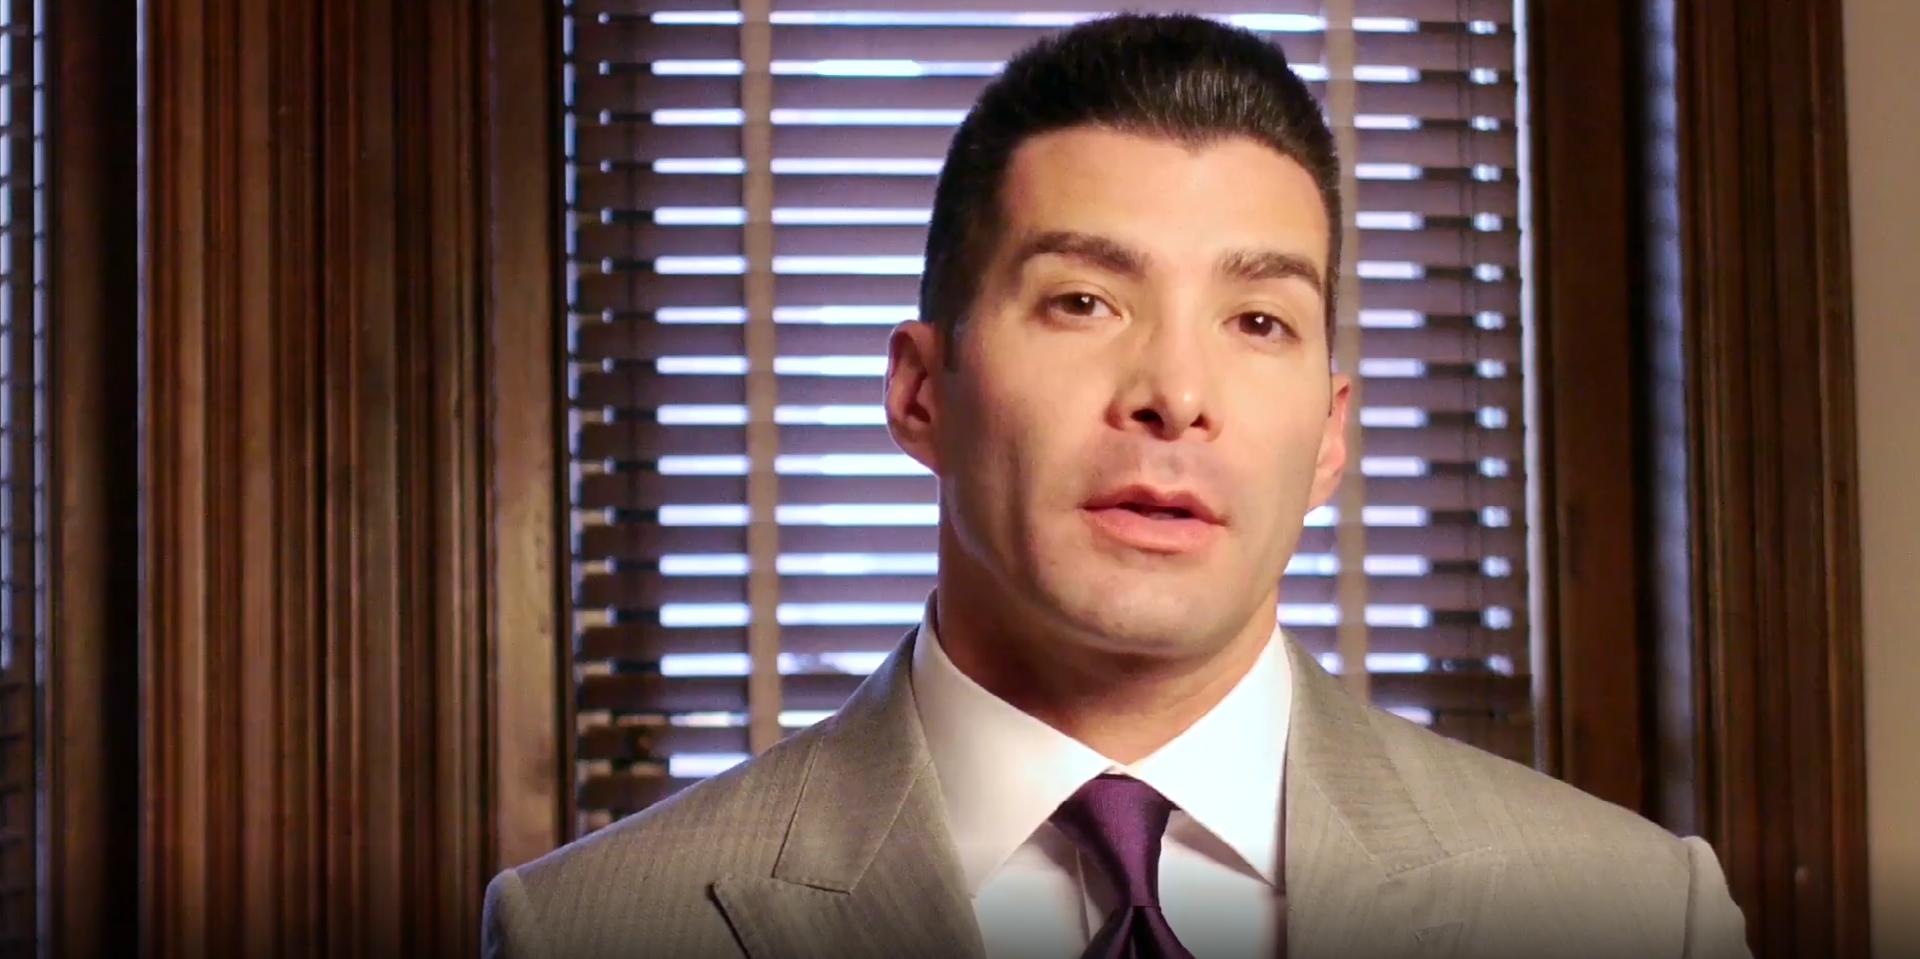 Attorney Joseph Lento